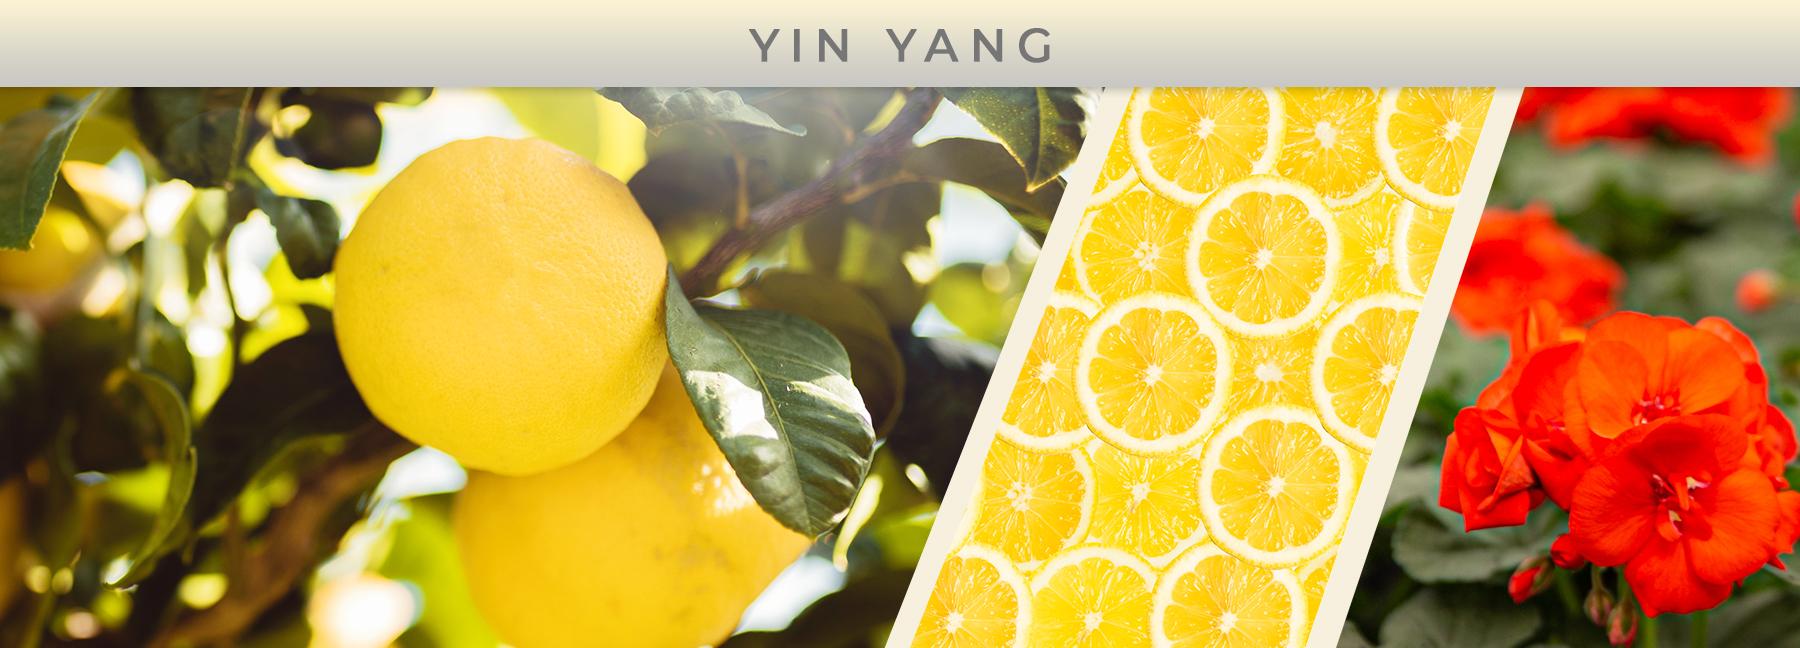 Yin Yang fragrance elements